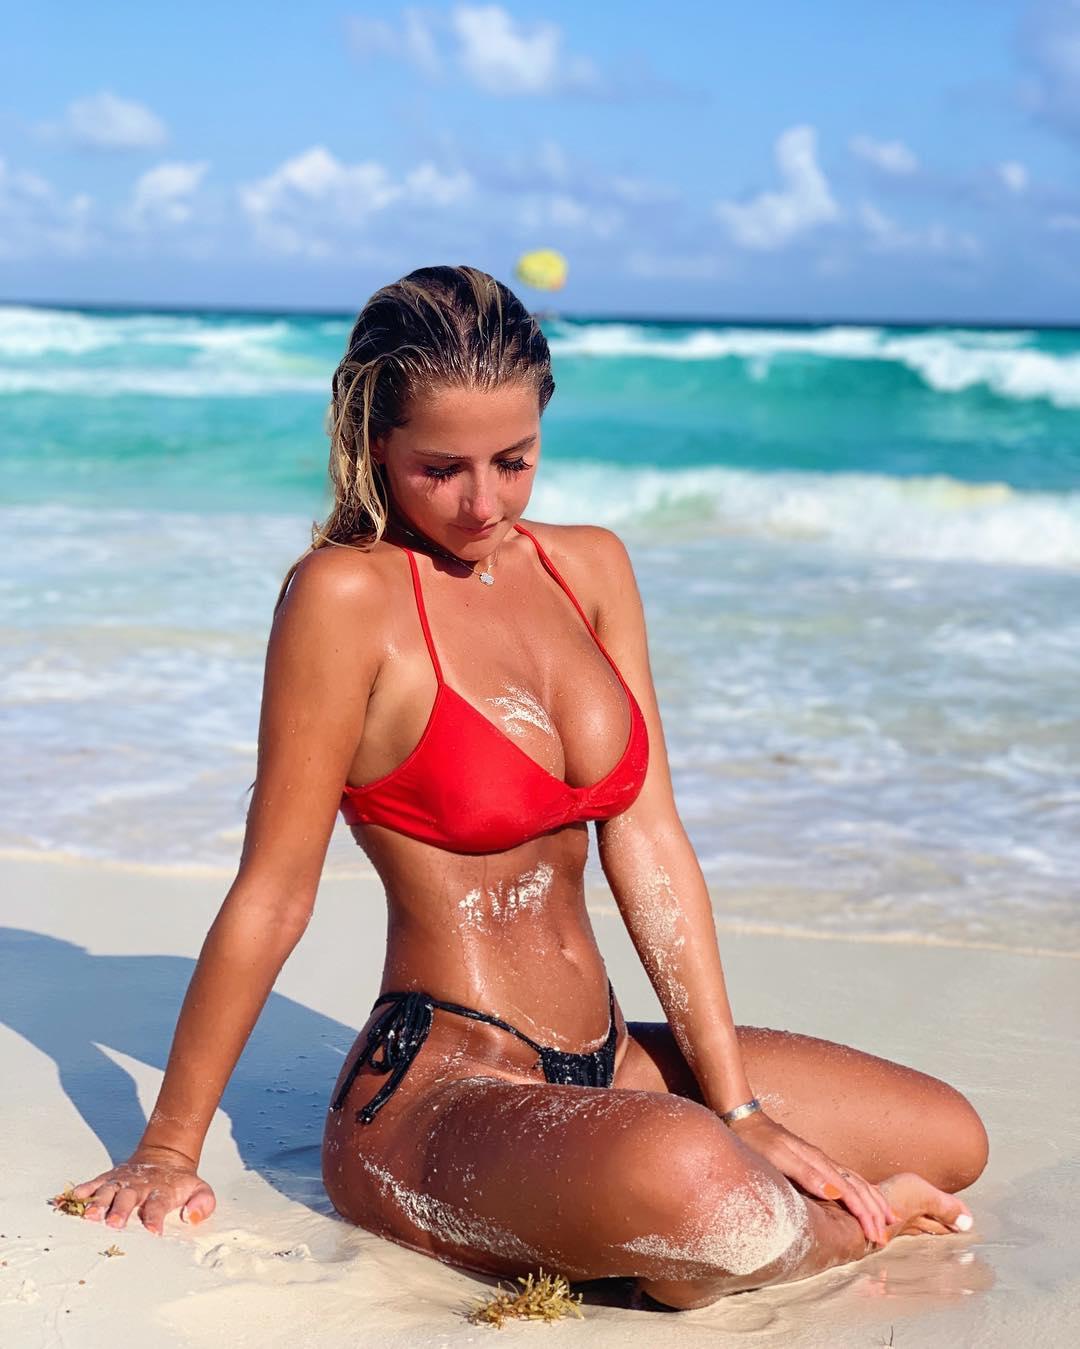 Kiki Passo, a brasileira que aquece a temperatura do futebol americano